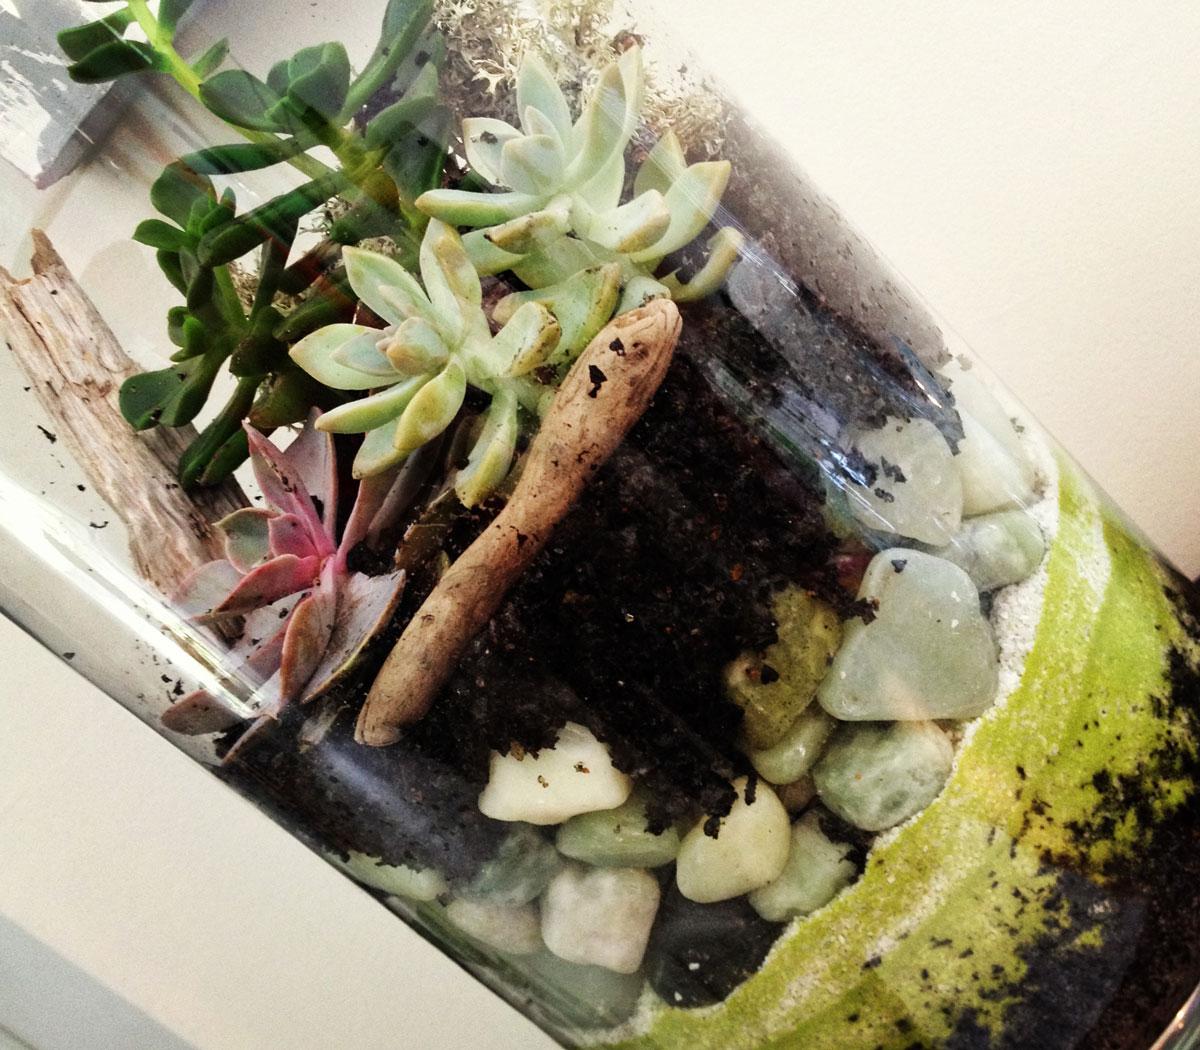 Terrarium-2018-Bucket-List-By-Bumble-and-Bustle-Blog